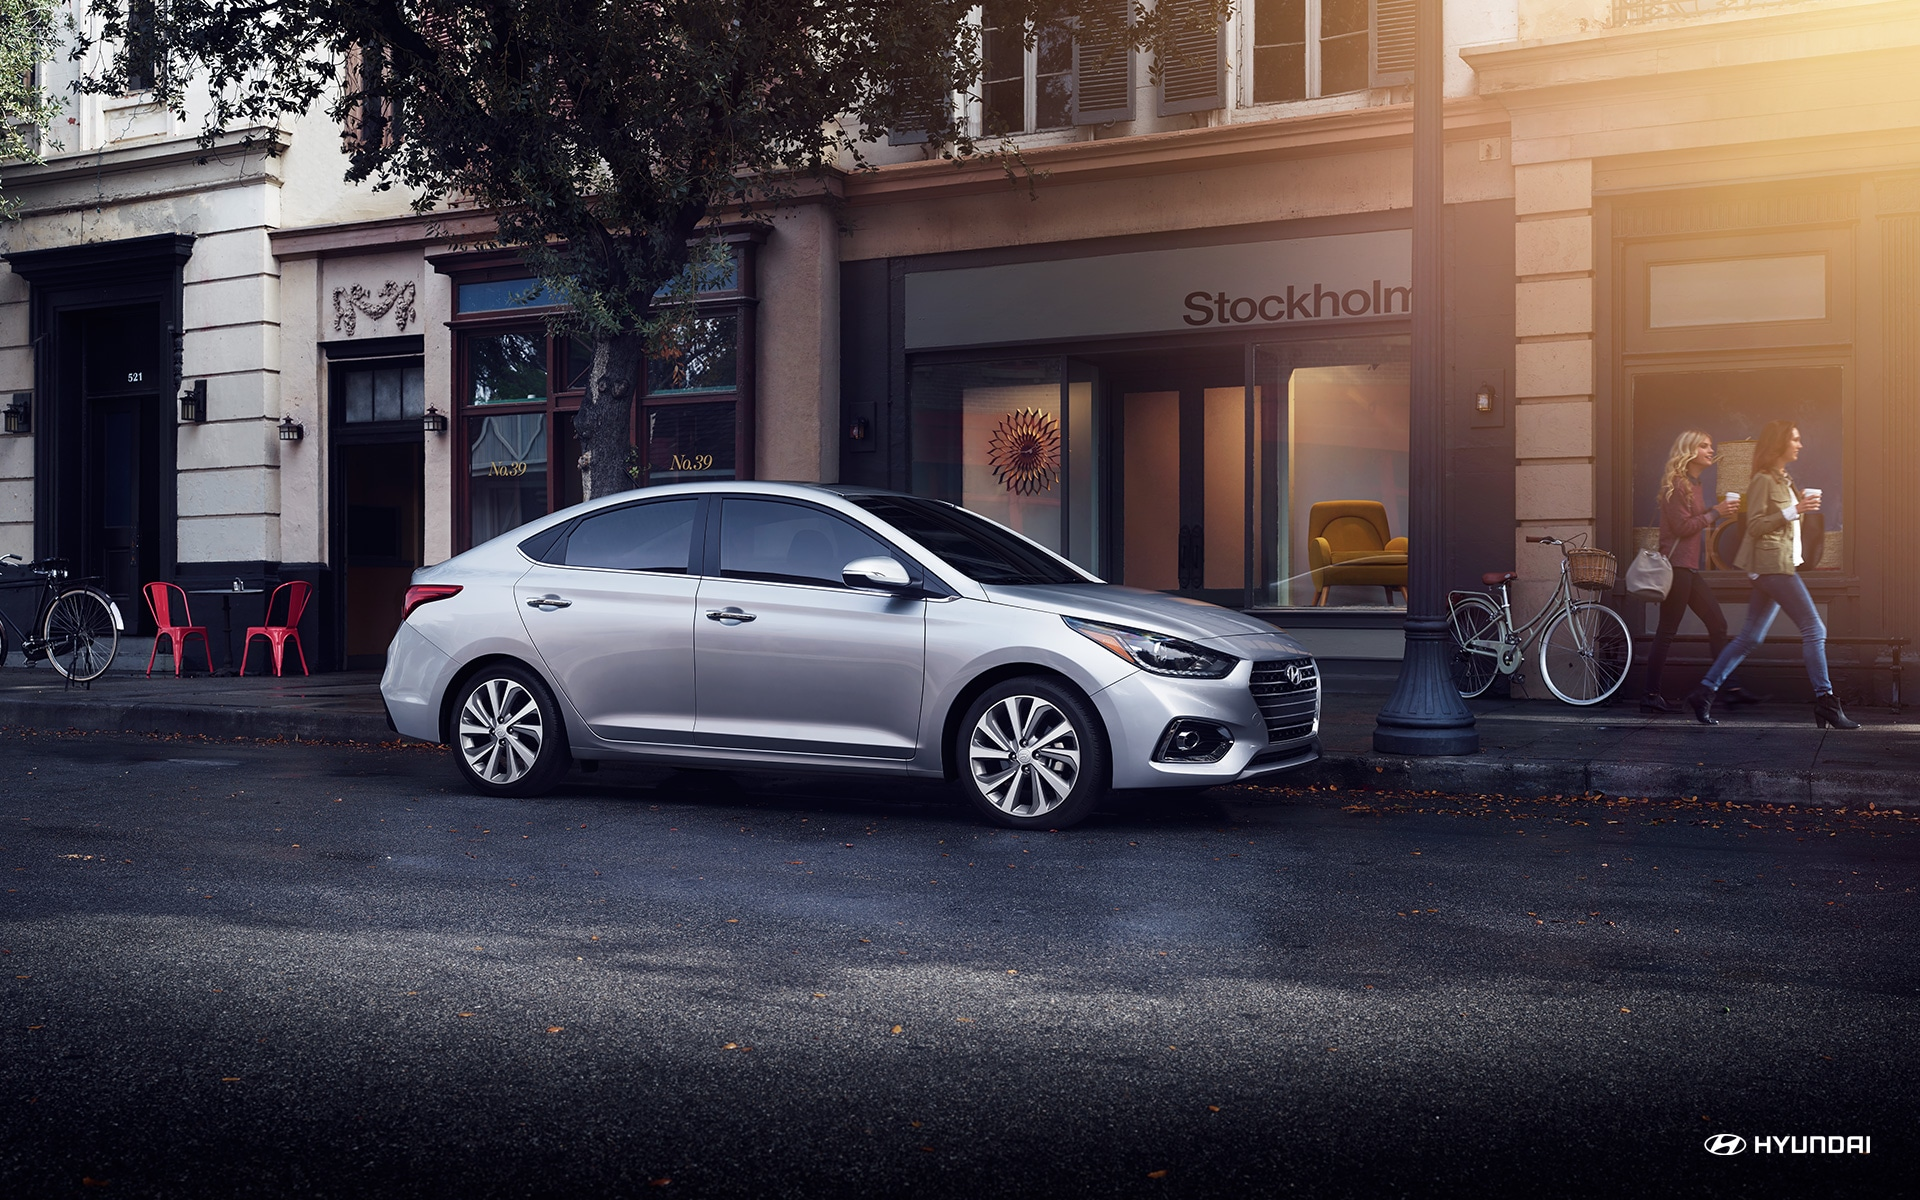 2019 Hyundai Accent Leasing near Bowie, MD